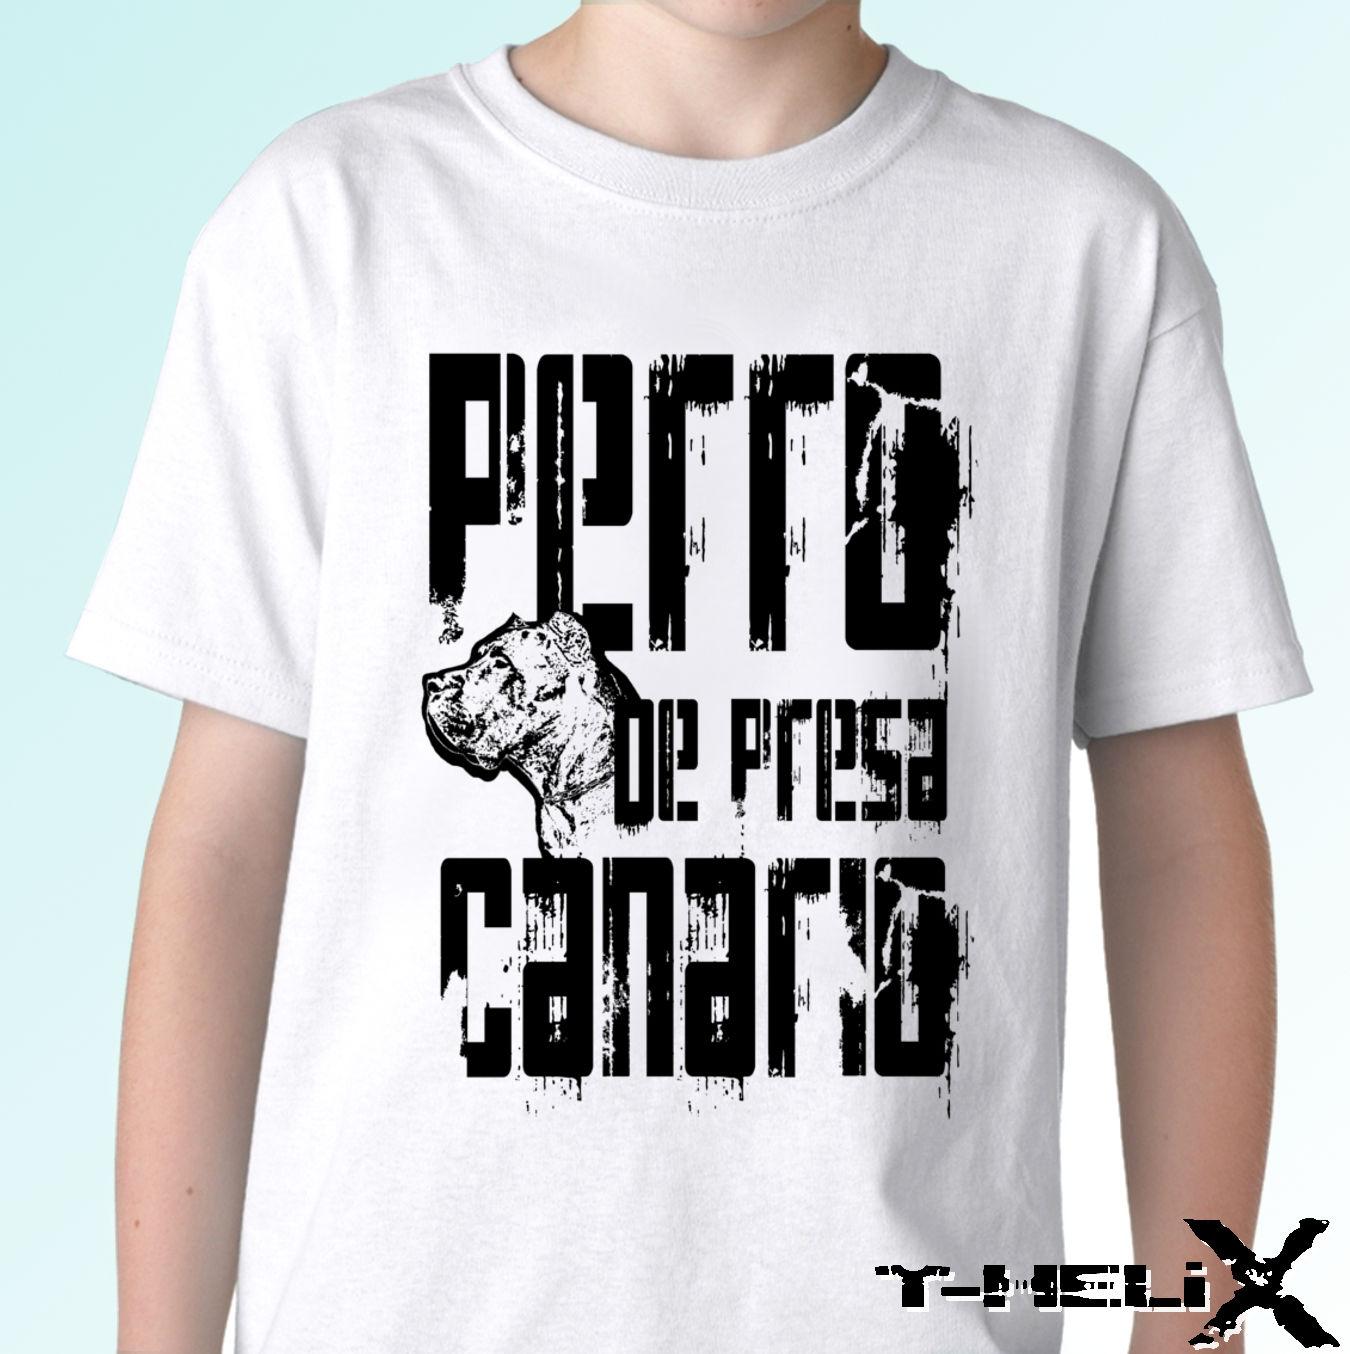 Perro De Presa Canario grey t shirt top tee dog design mens sizes